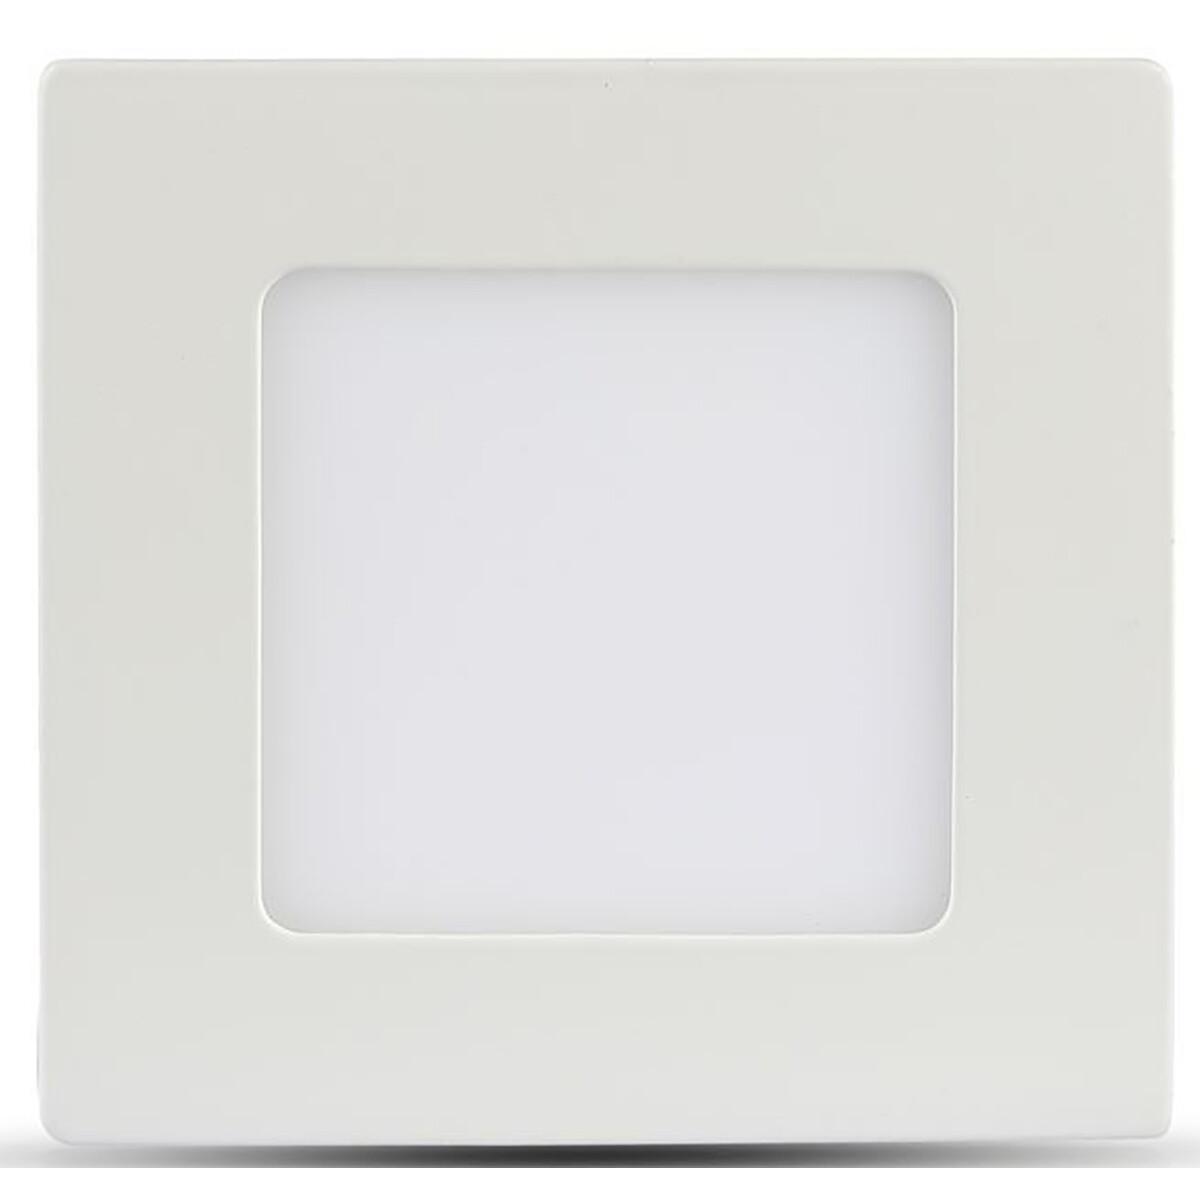 SAMSUNG - LED Downlight Slim - Viron Dunson - Inbouw Vierkant 24W - Natuurlijk Wit 4000K - Mat Wit -